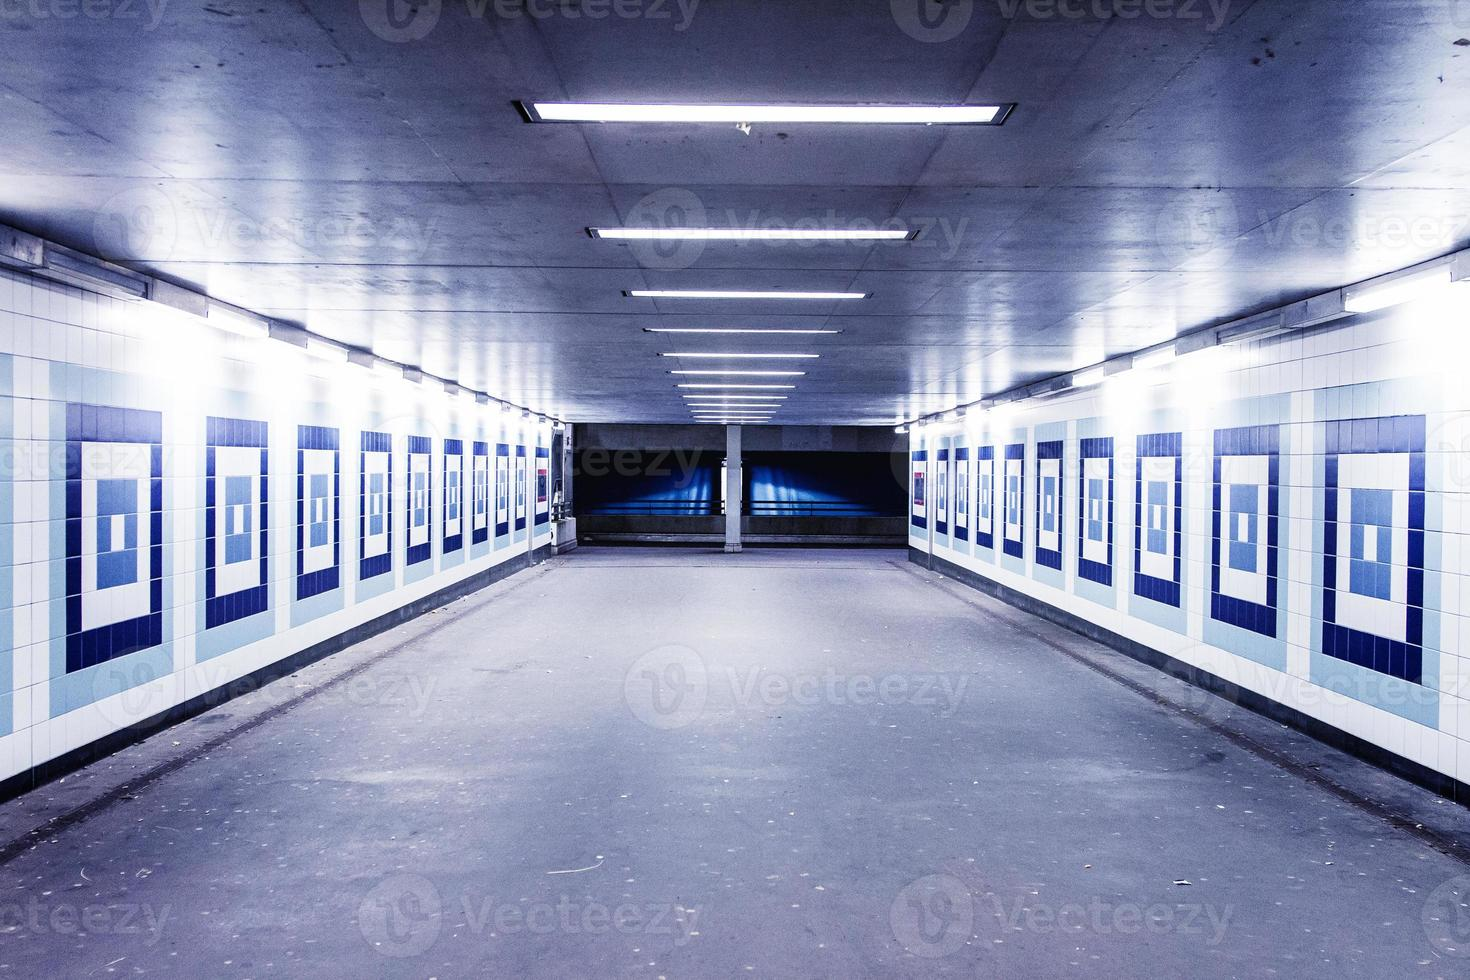 Mesmorizing Tunnel photo